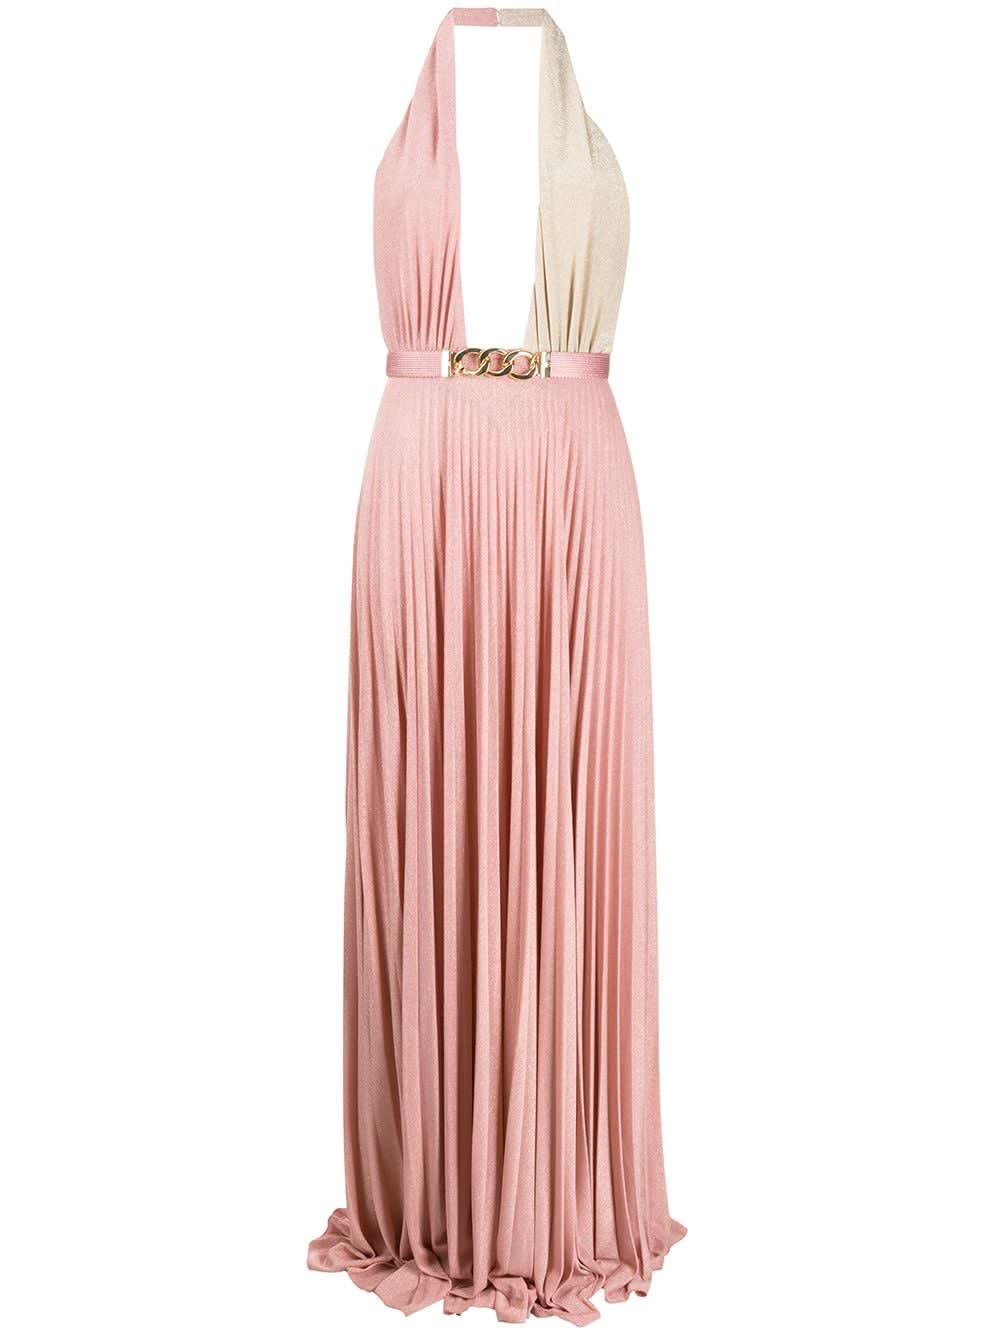 Buy Elisabetta Franchi Celyn B. Dress With Belt online, shop Elisabetta Franchi Celyn B. with free shipping